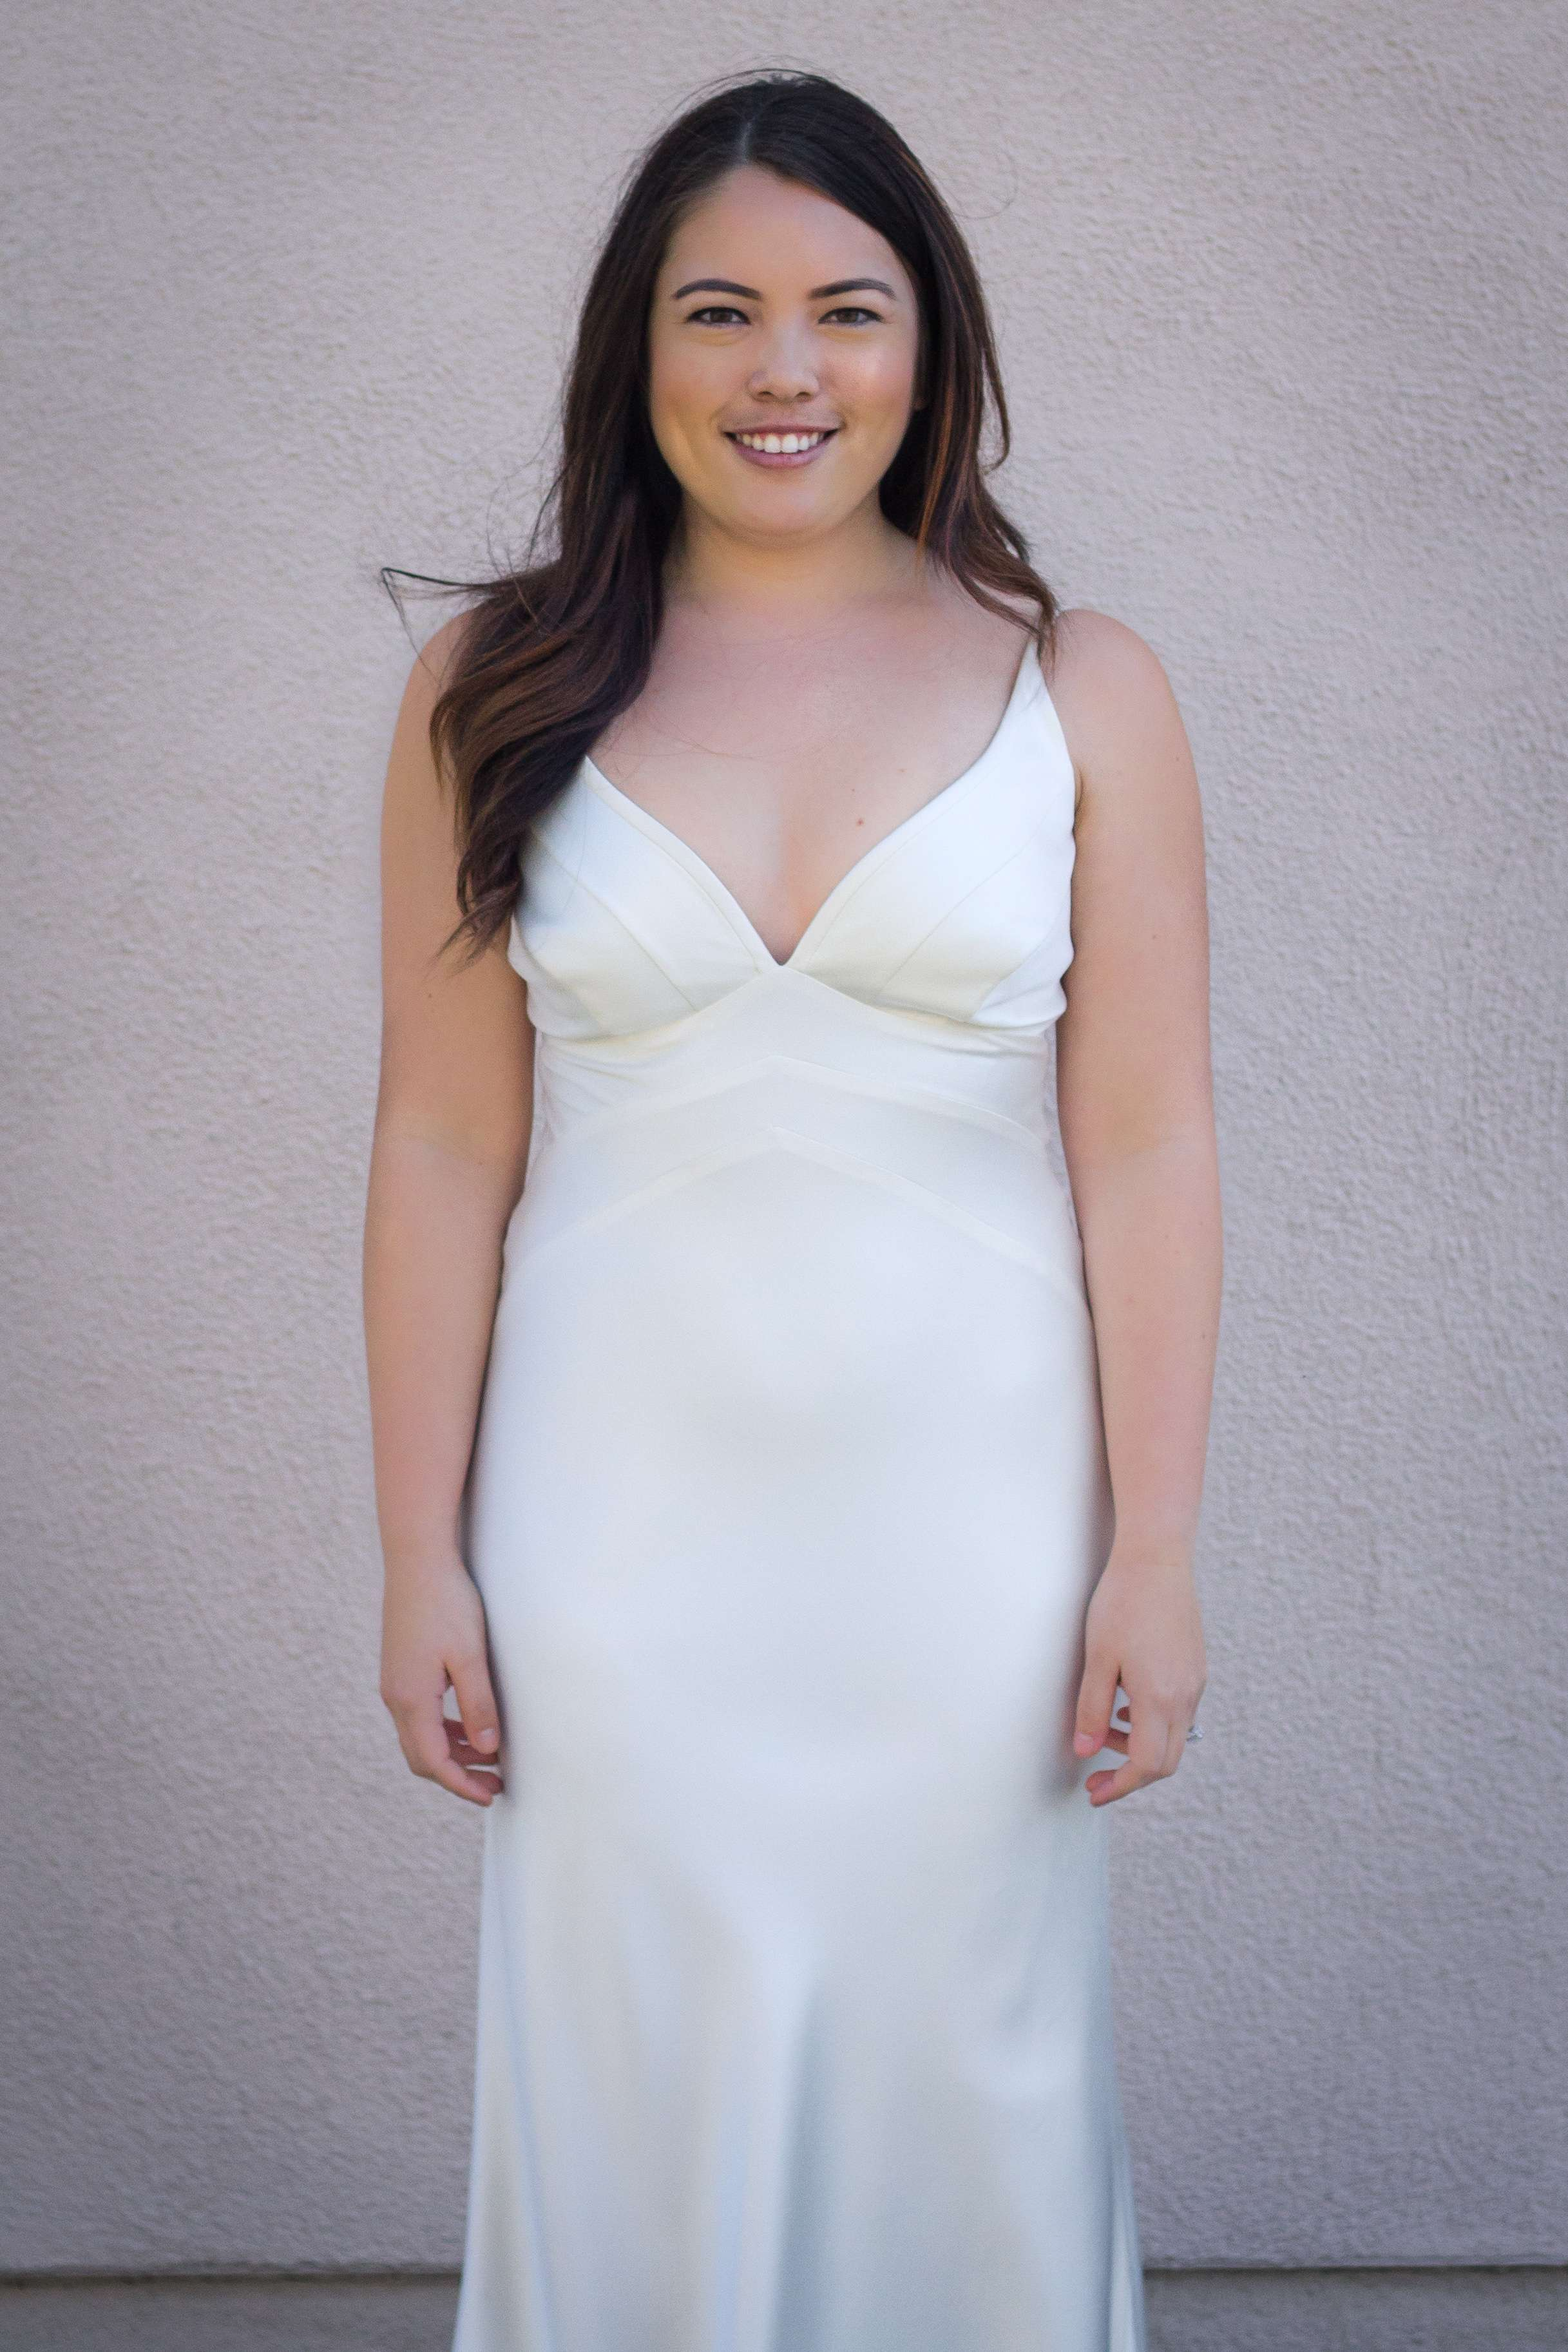 Dress: Suzanne Neville